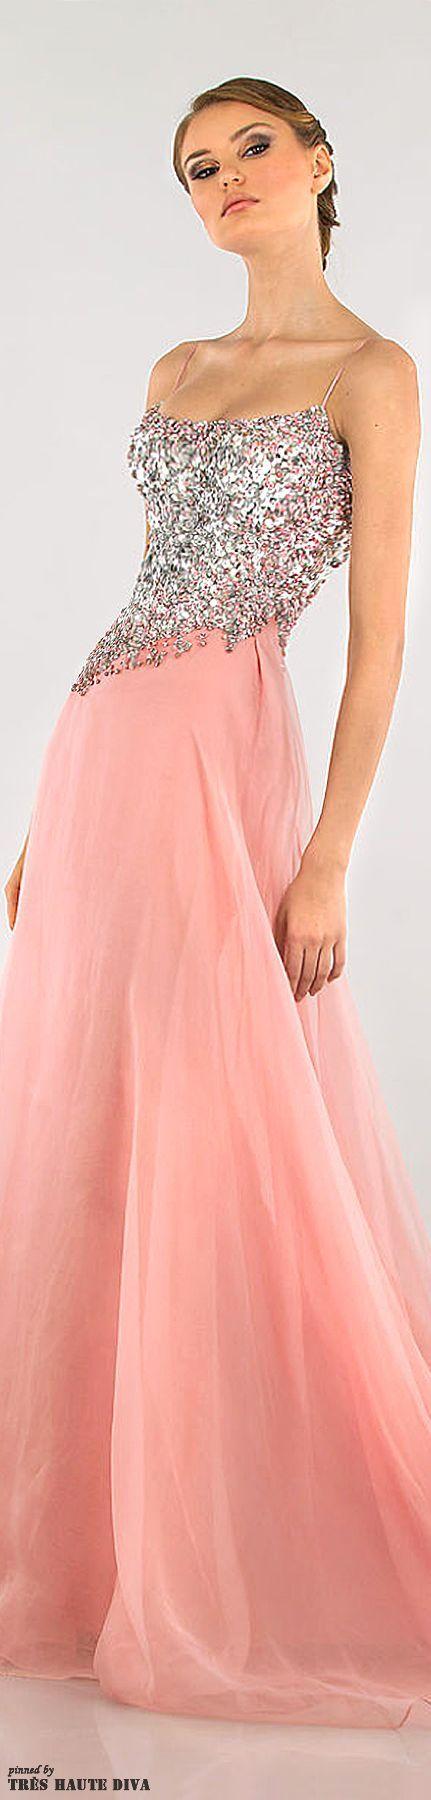 26 best vestidos images on Pinterest | Cute dresses, Beautiful ...